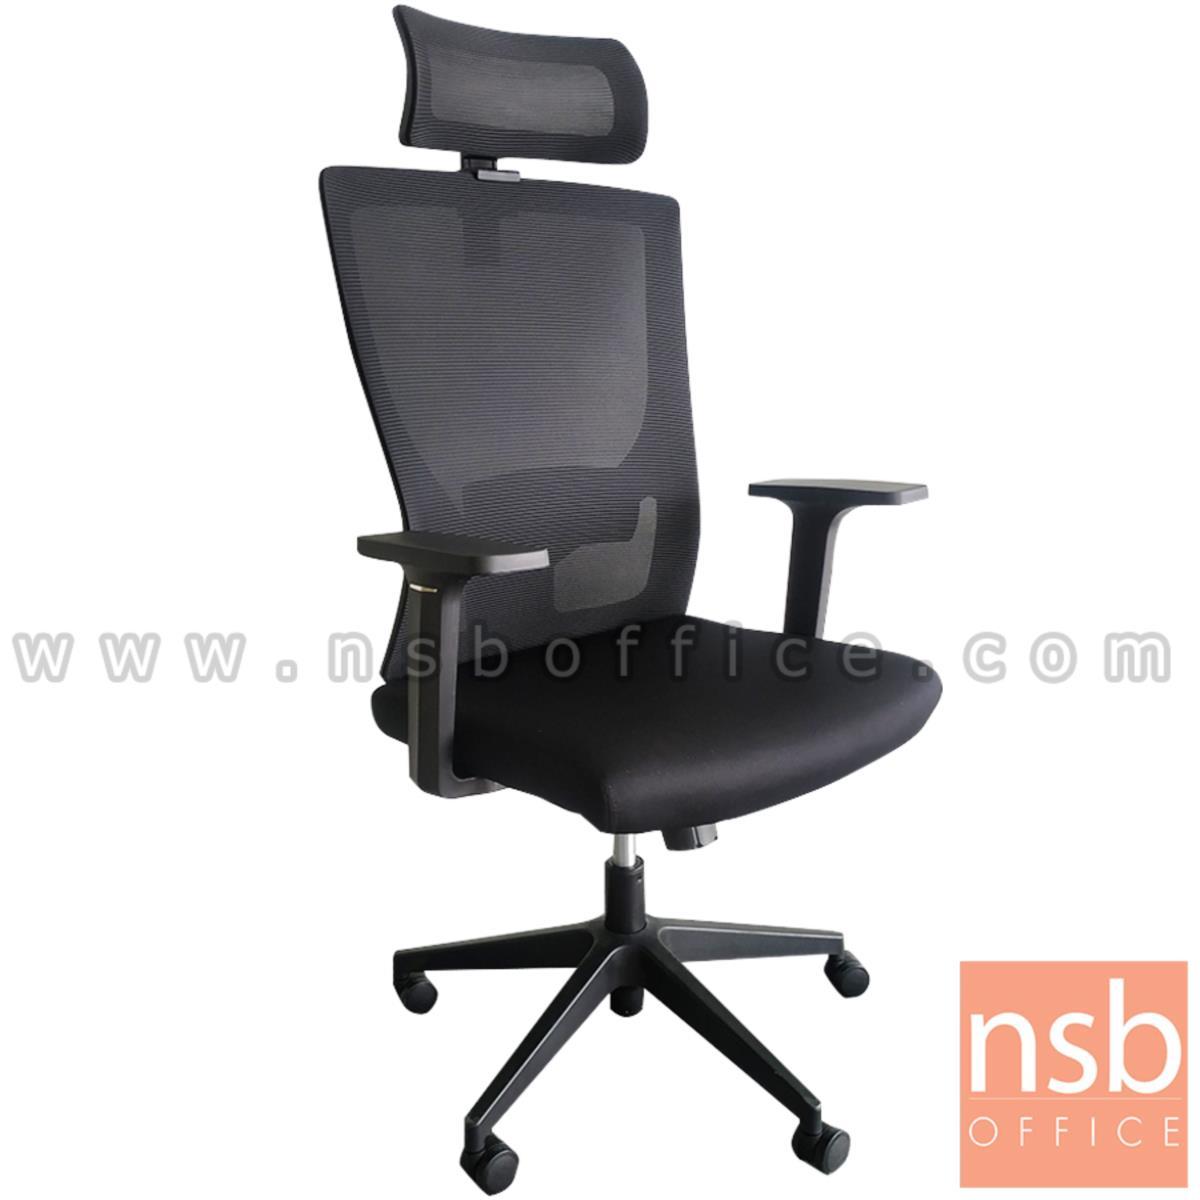 B28A126:เก้าอี้ผู้บริหารหลังเน็ต รุ่น Delaxio (ดีแล็กซิโอ)  โช๊คแก๊ส ก้อนโยก ขาพลาสติก